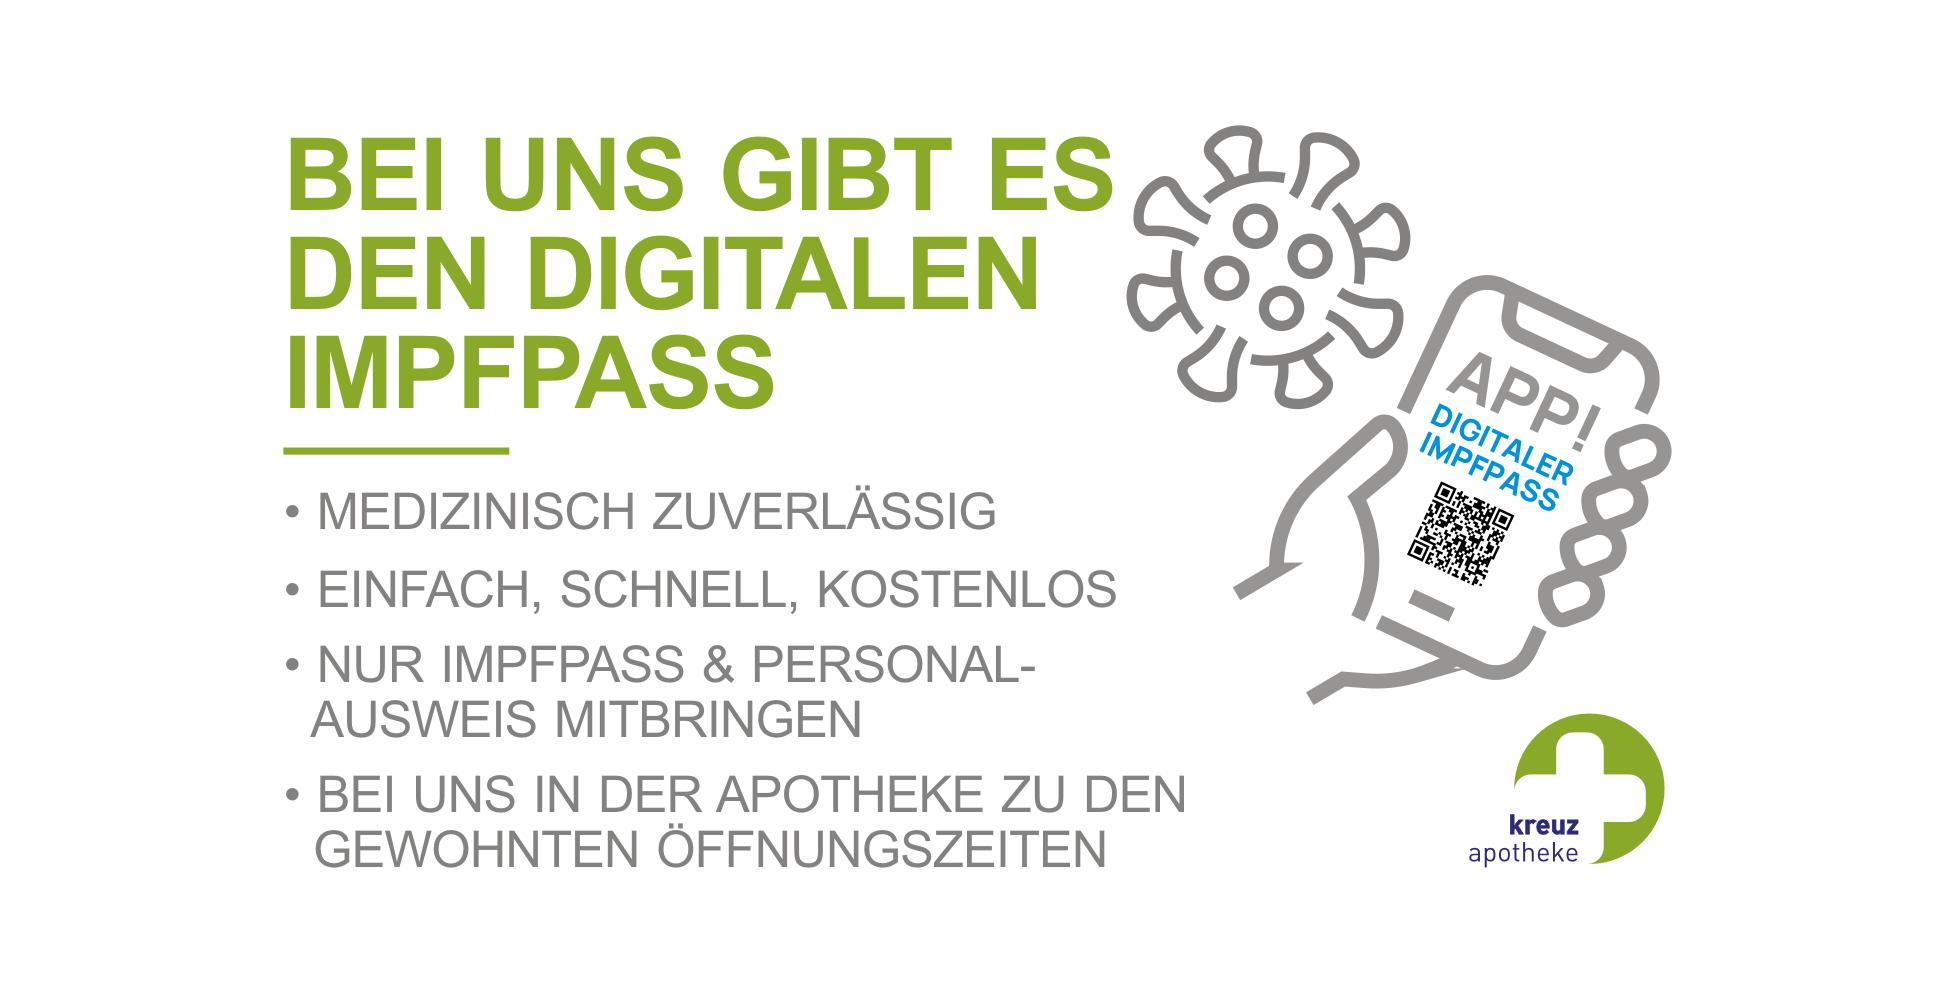 Kreuz Apotheke Digitaler Impfpass Ab 14 06 21 Kreuz Apotheke Mengen De